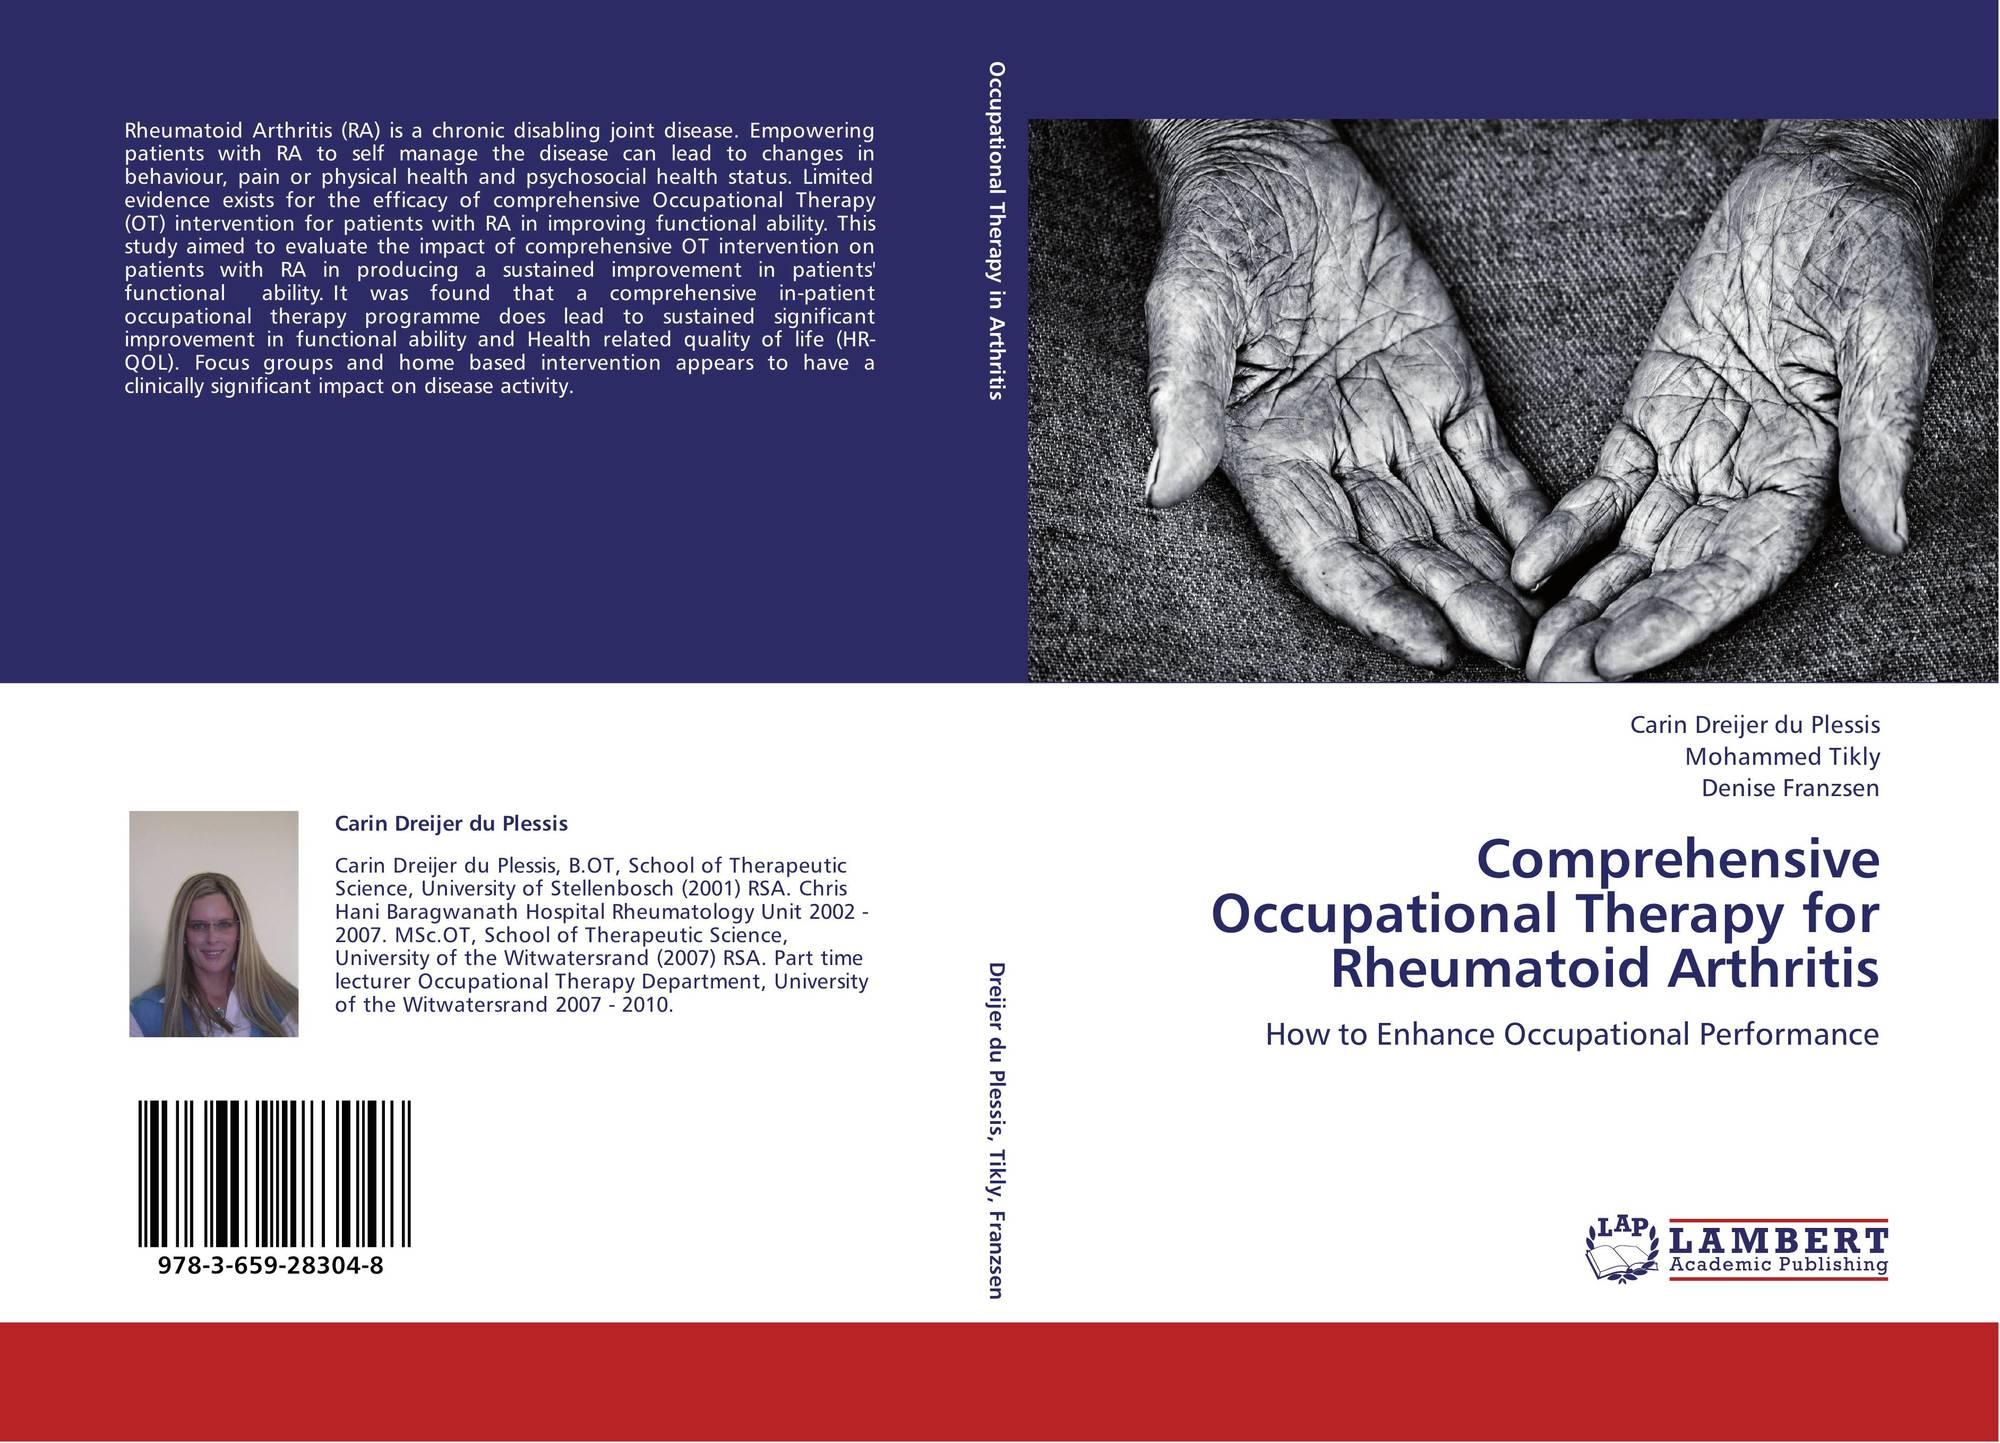 rheumatoid arthritis case study occupational therapy